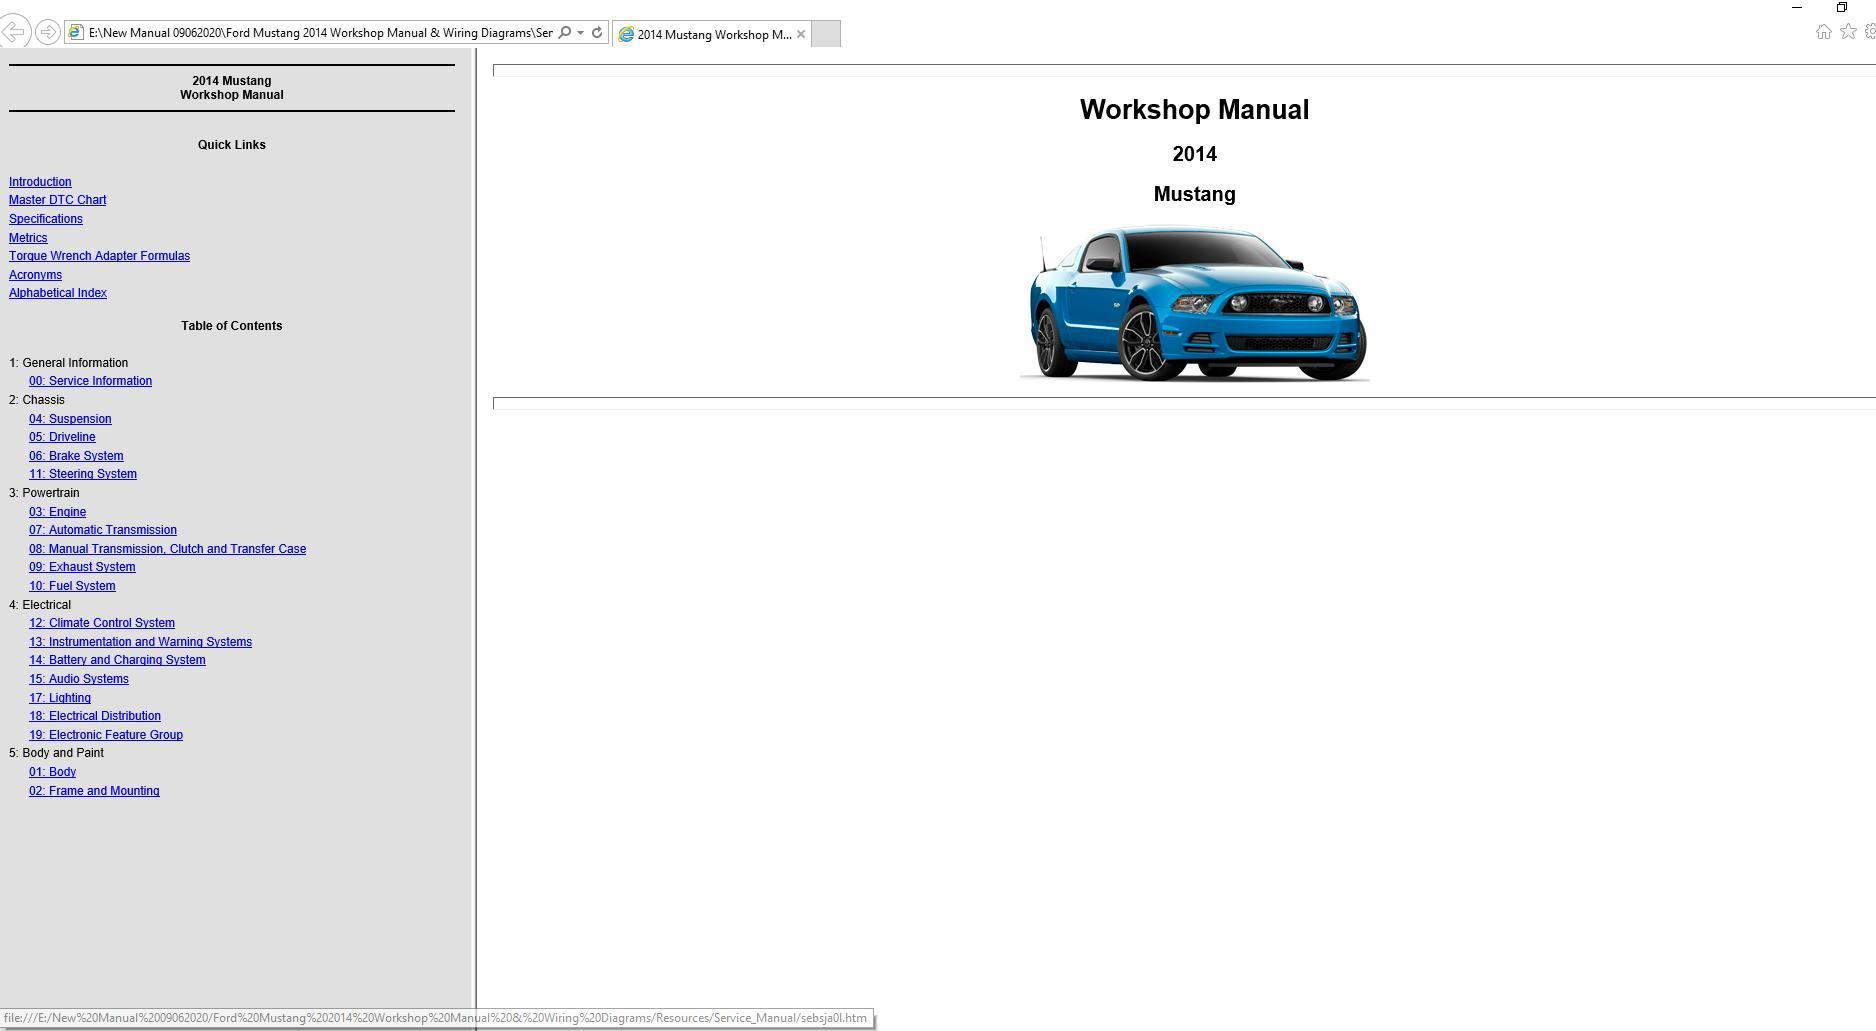 ford mustang 2014 workshop manual & wiring diagrams | auto repair manual  forum - heavy equipment forums - download repair & workshop manual  autorepairmanuals.ws